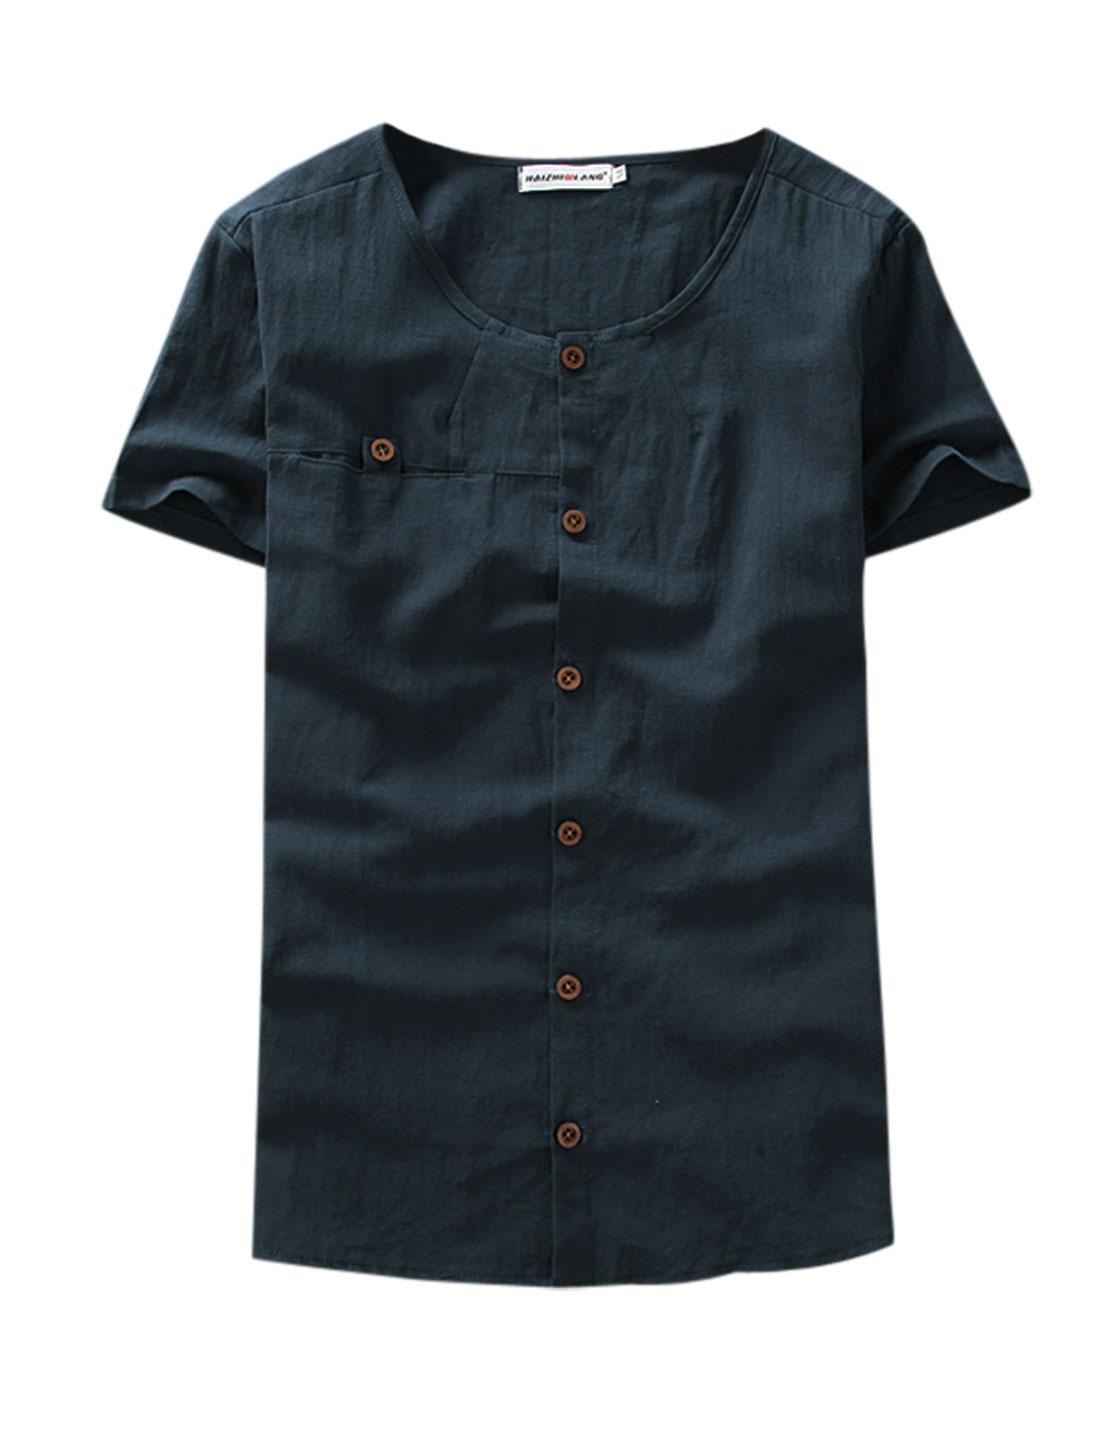 Men Short Sleeves Single Breasted Chest Pocket Linen Tee Navy Blue M